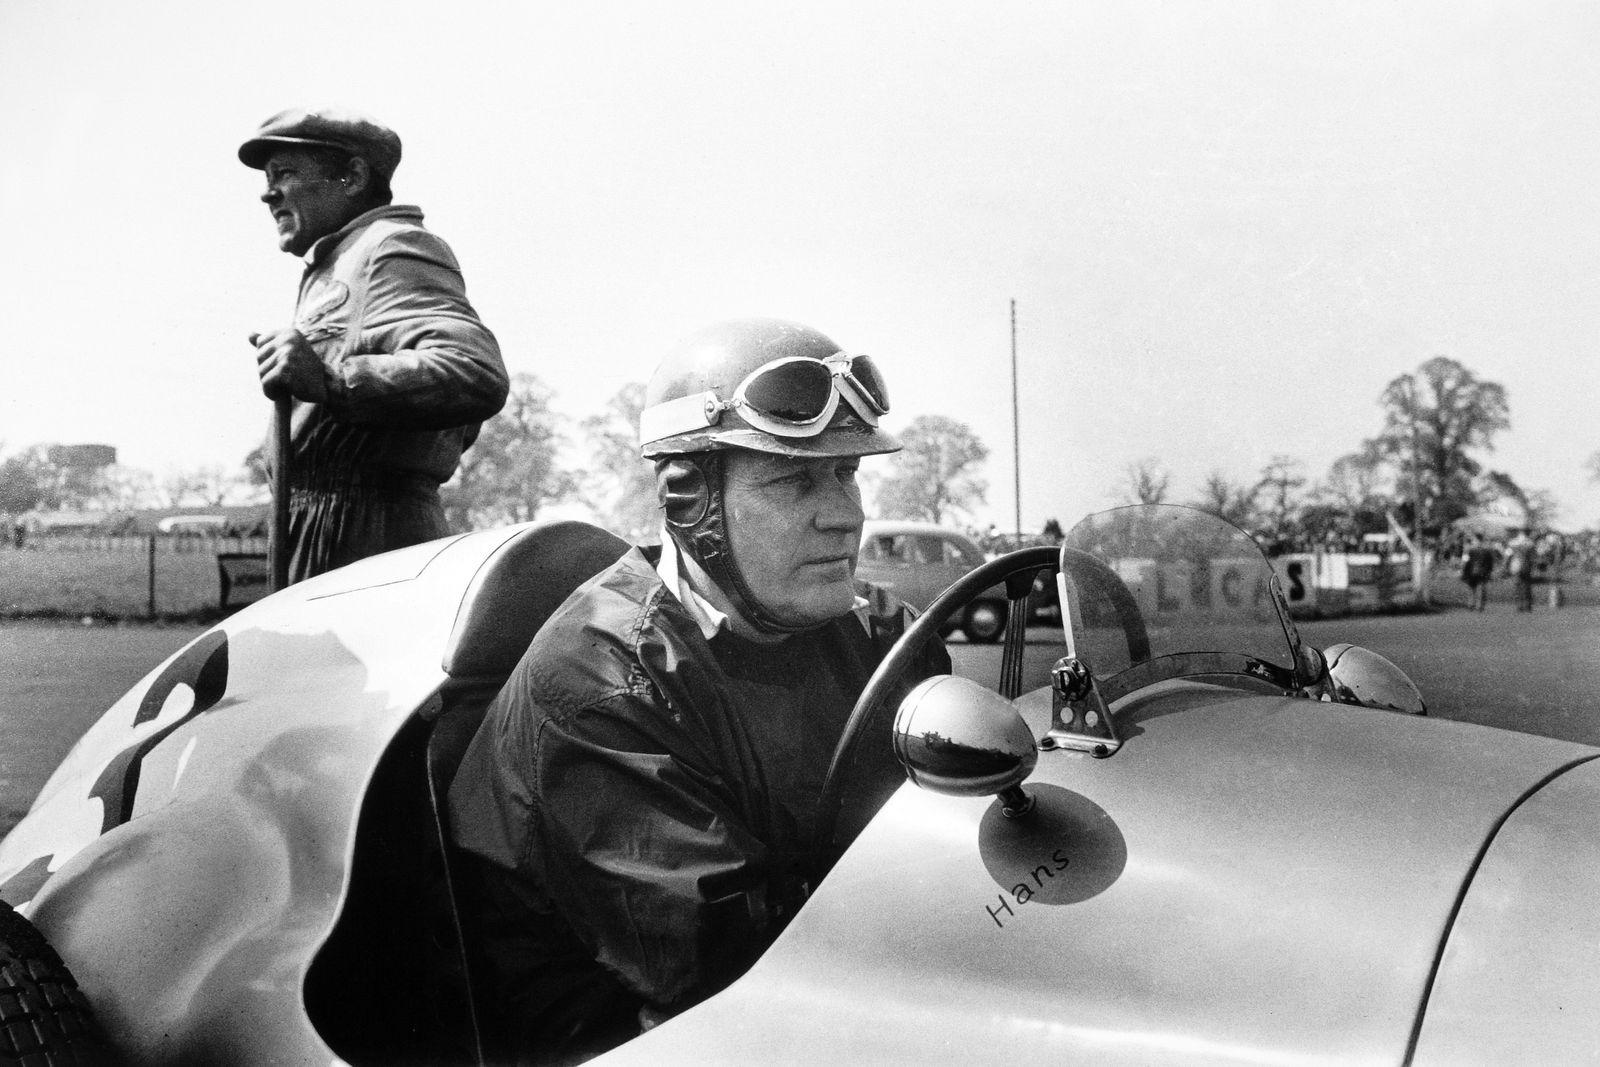 1953 Daily Express International Trophy. Silverstone, Great Britain. 9 May 1953. Hans Stuck (AFM-Kuchen), portrait. PUB